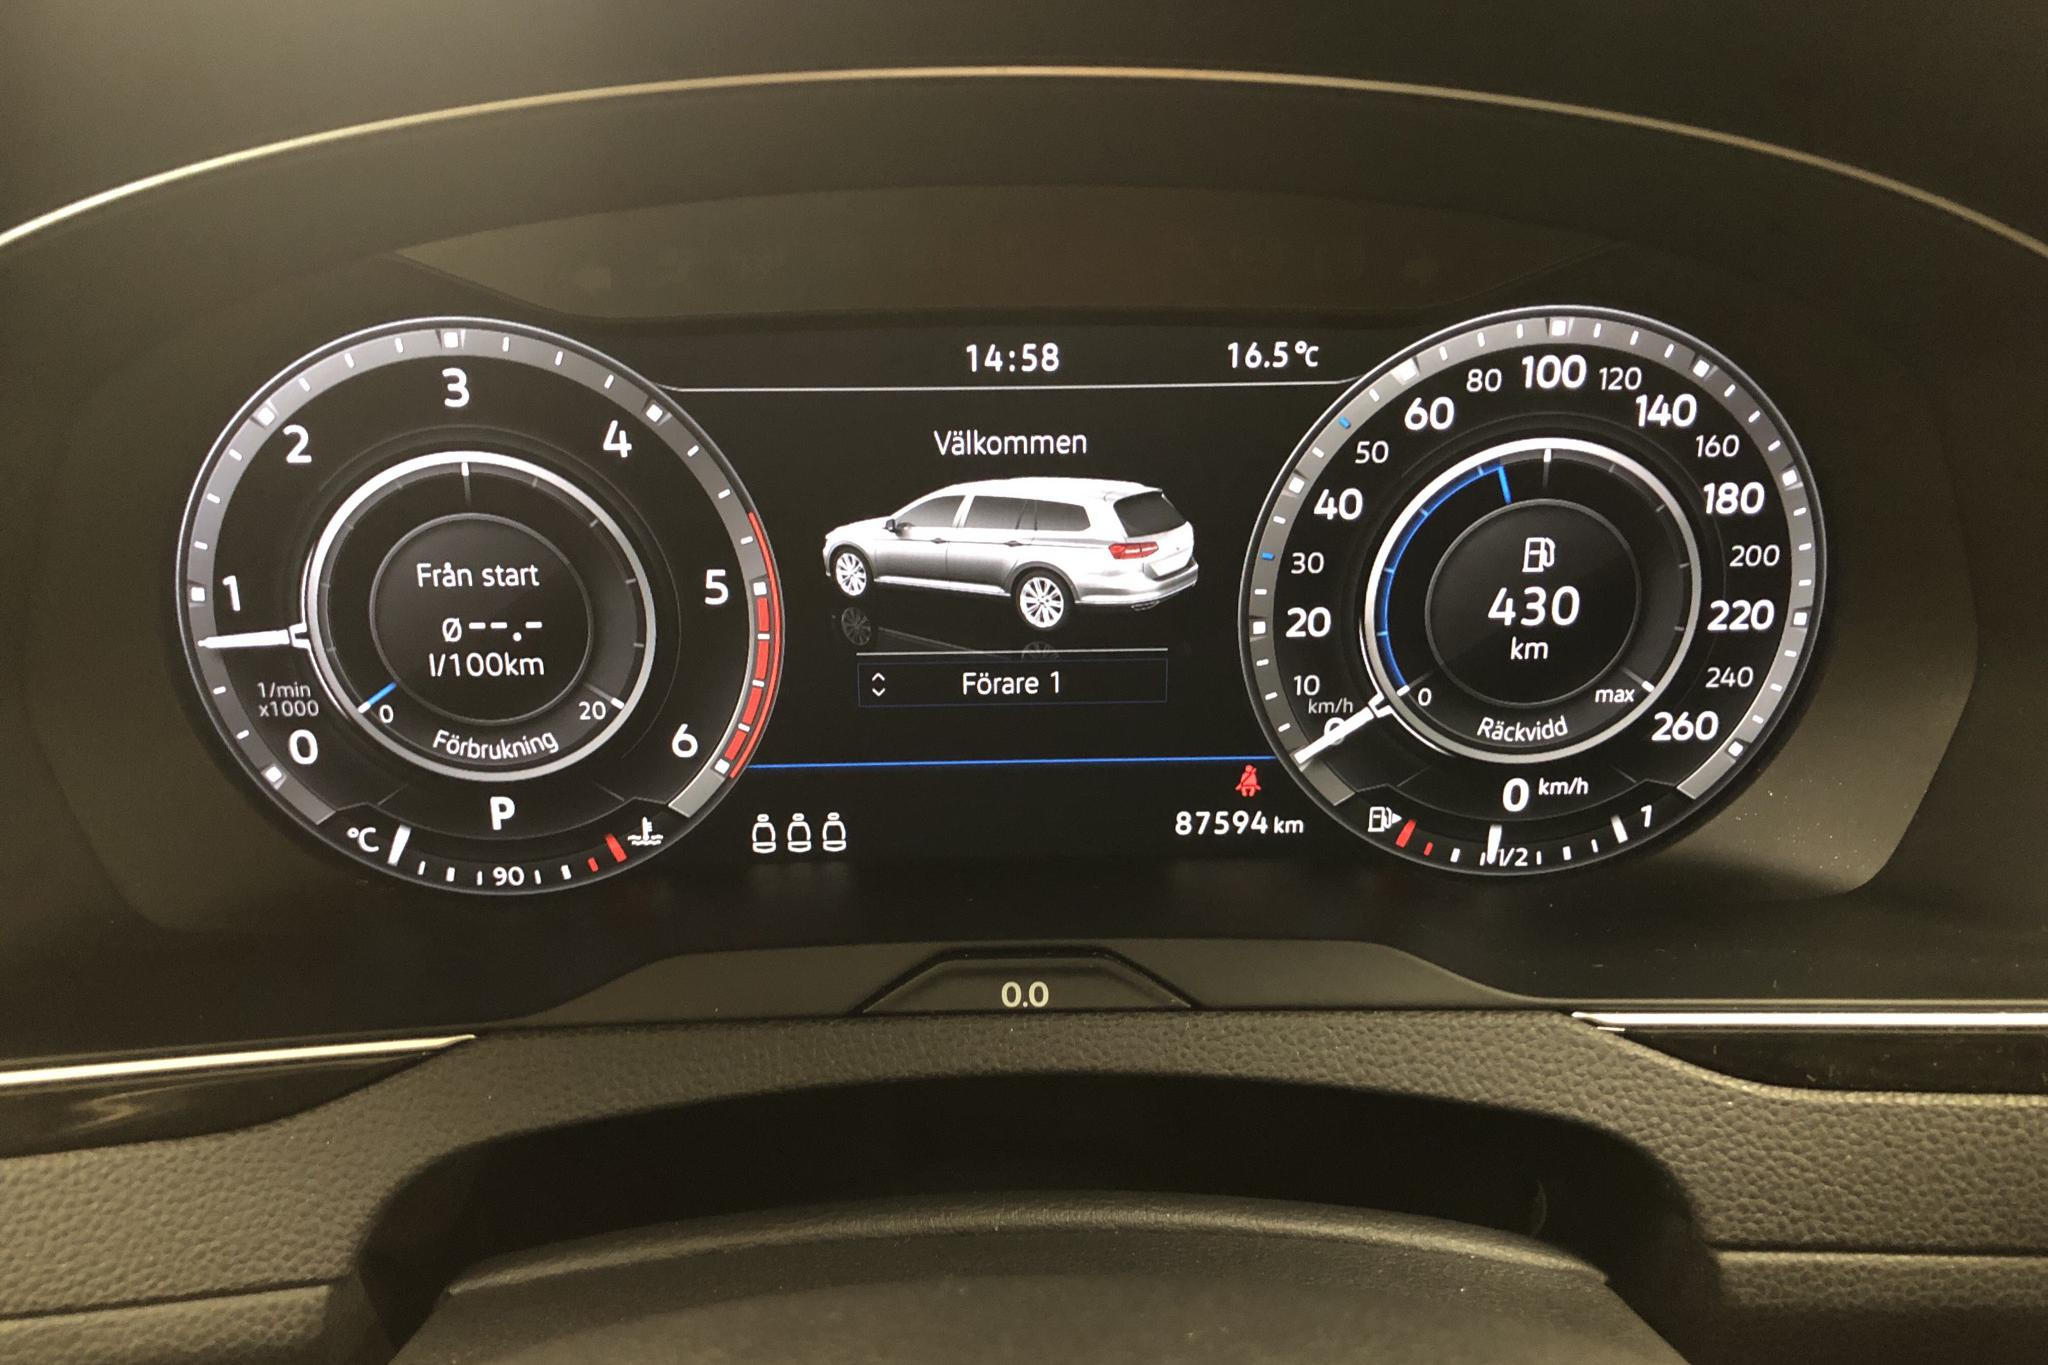 VW Passat Alltrack 2.0 TDI Sportscombi 4MOTION (190hk) - 87 590 km - Automatic - Dark Grey - 2018